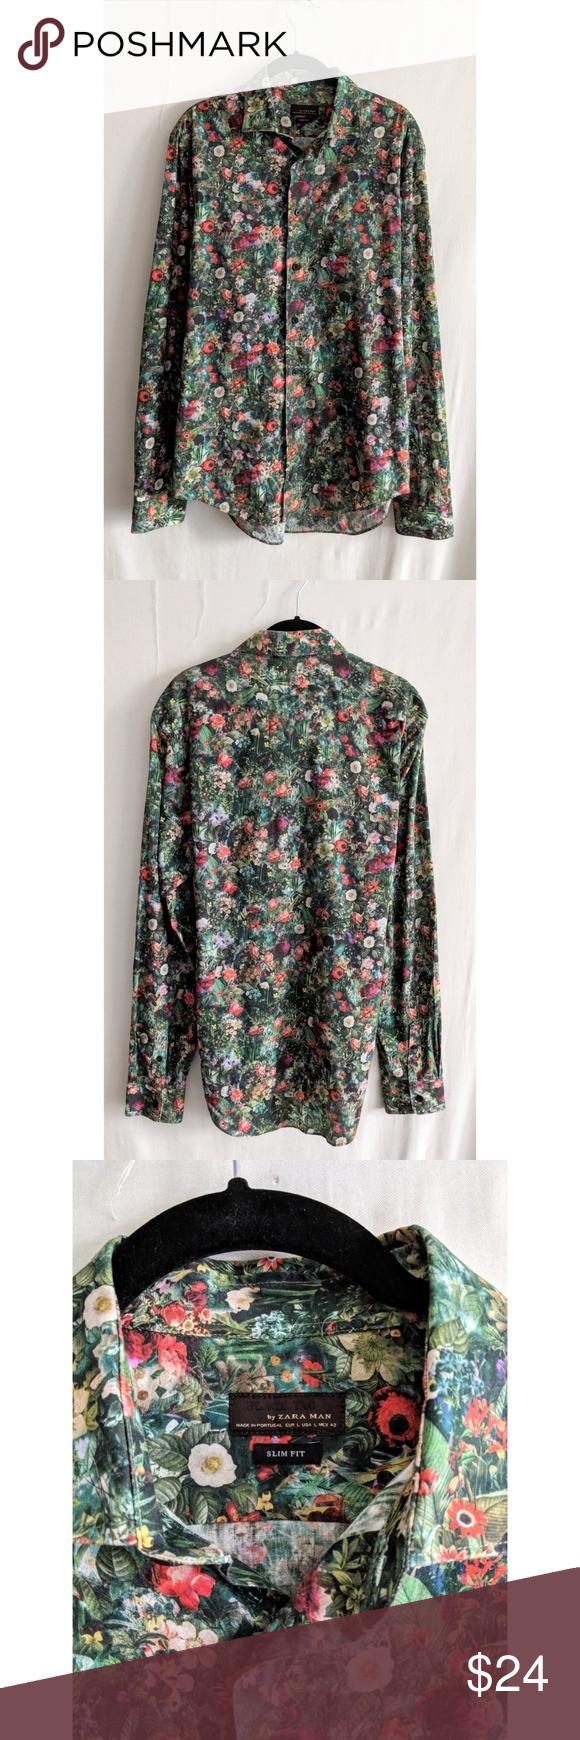 2e2ee8395f1b Zara Floral Print Slim Fit Button Up Shirt Zara men Black Tag slim ...